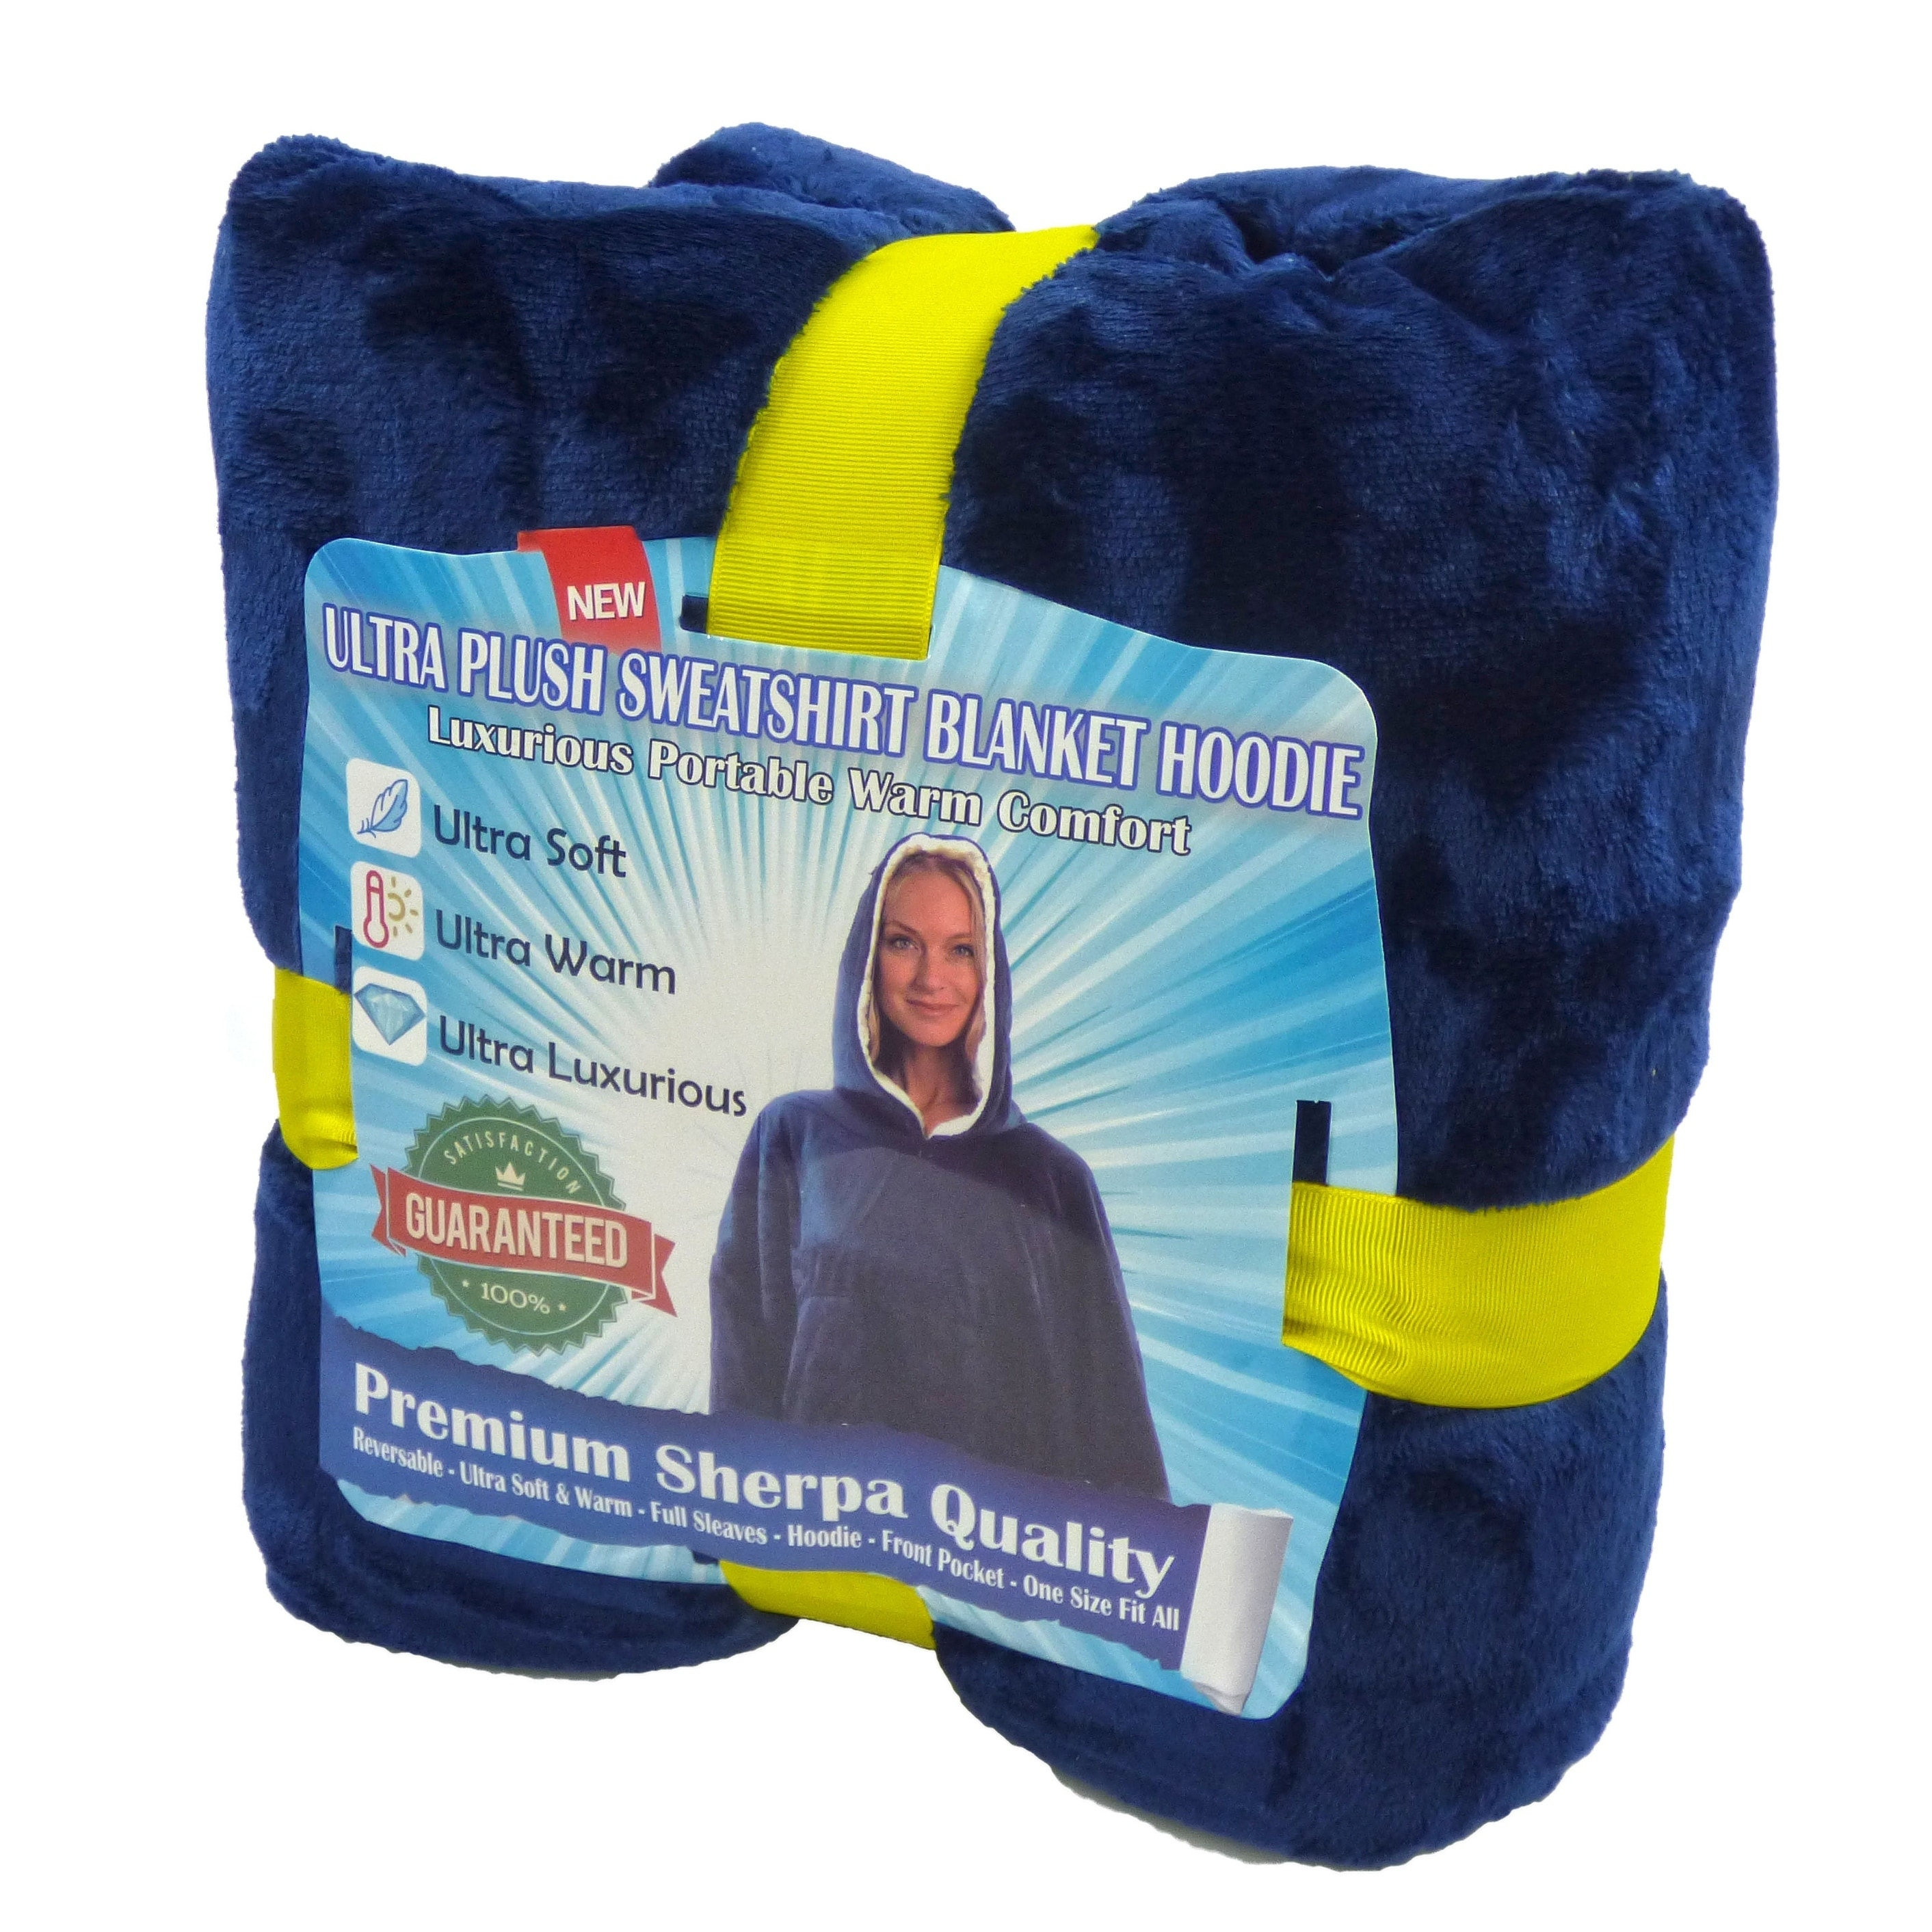 Hoodie Blanket Oversized Ultra-Plush Comfy Sherpa-Revisible Sweatshirt Blanket